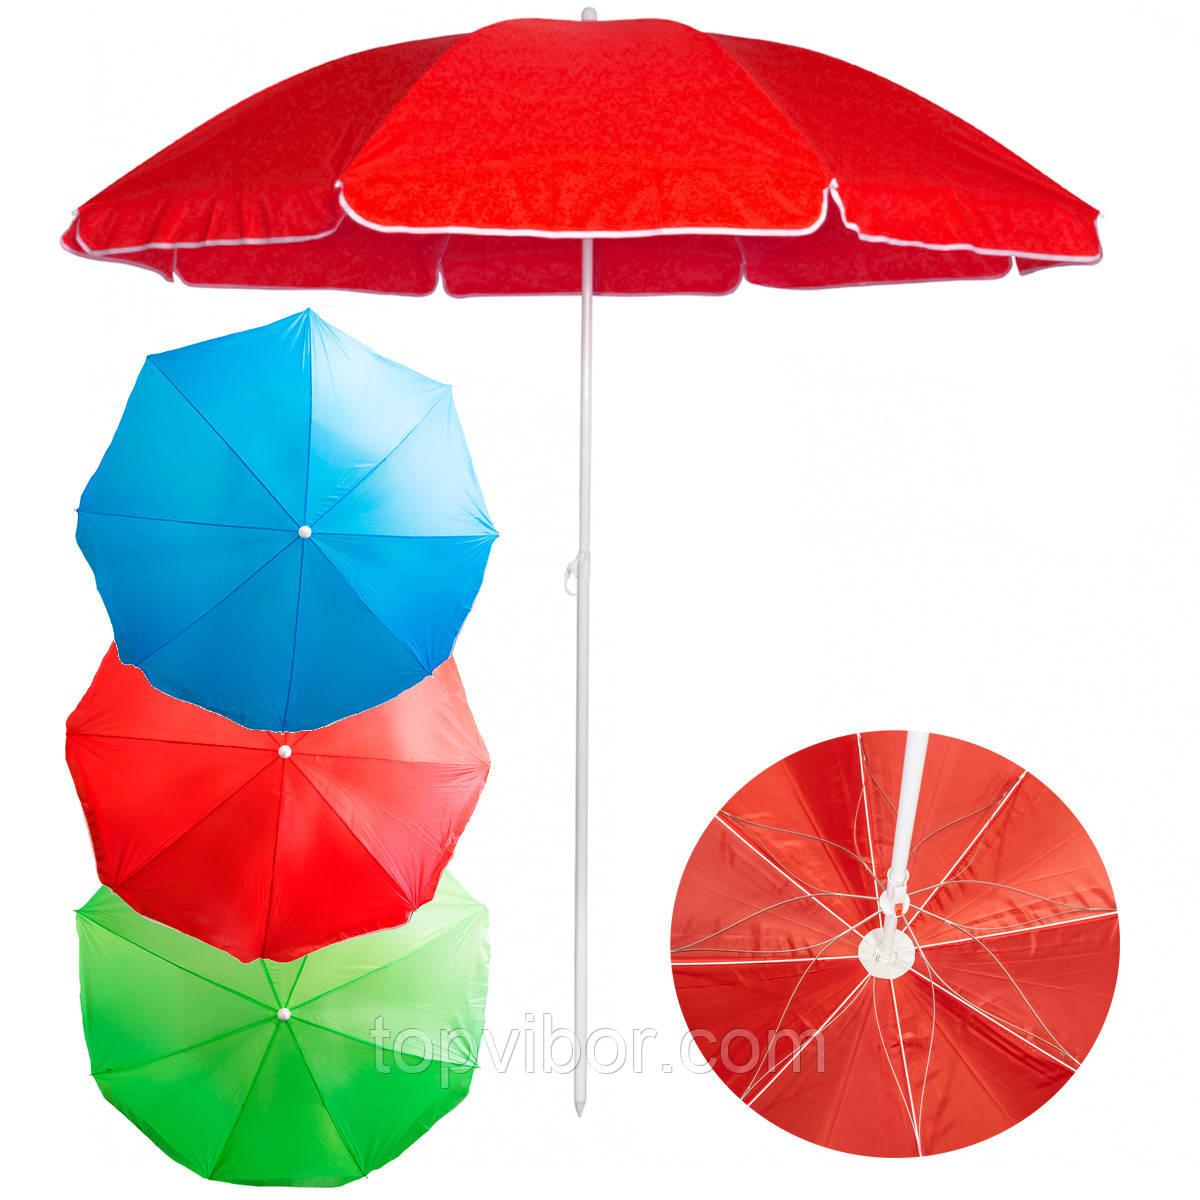 "Сонцезахисна парасолька ""Stenson - Червона"" 2,1 м, великий зонт пляжний посилений (система ромашка)"